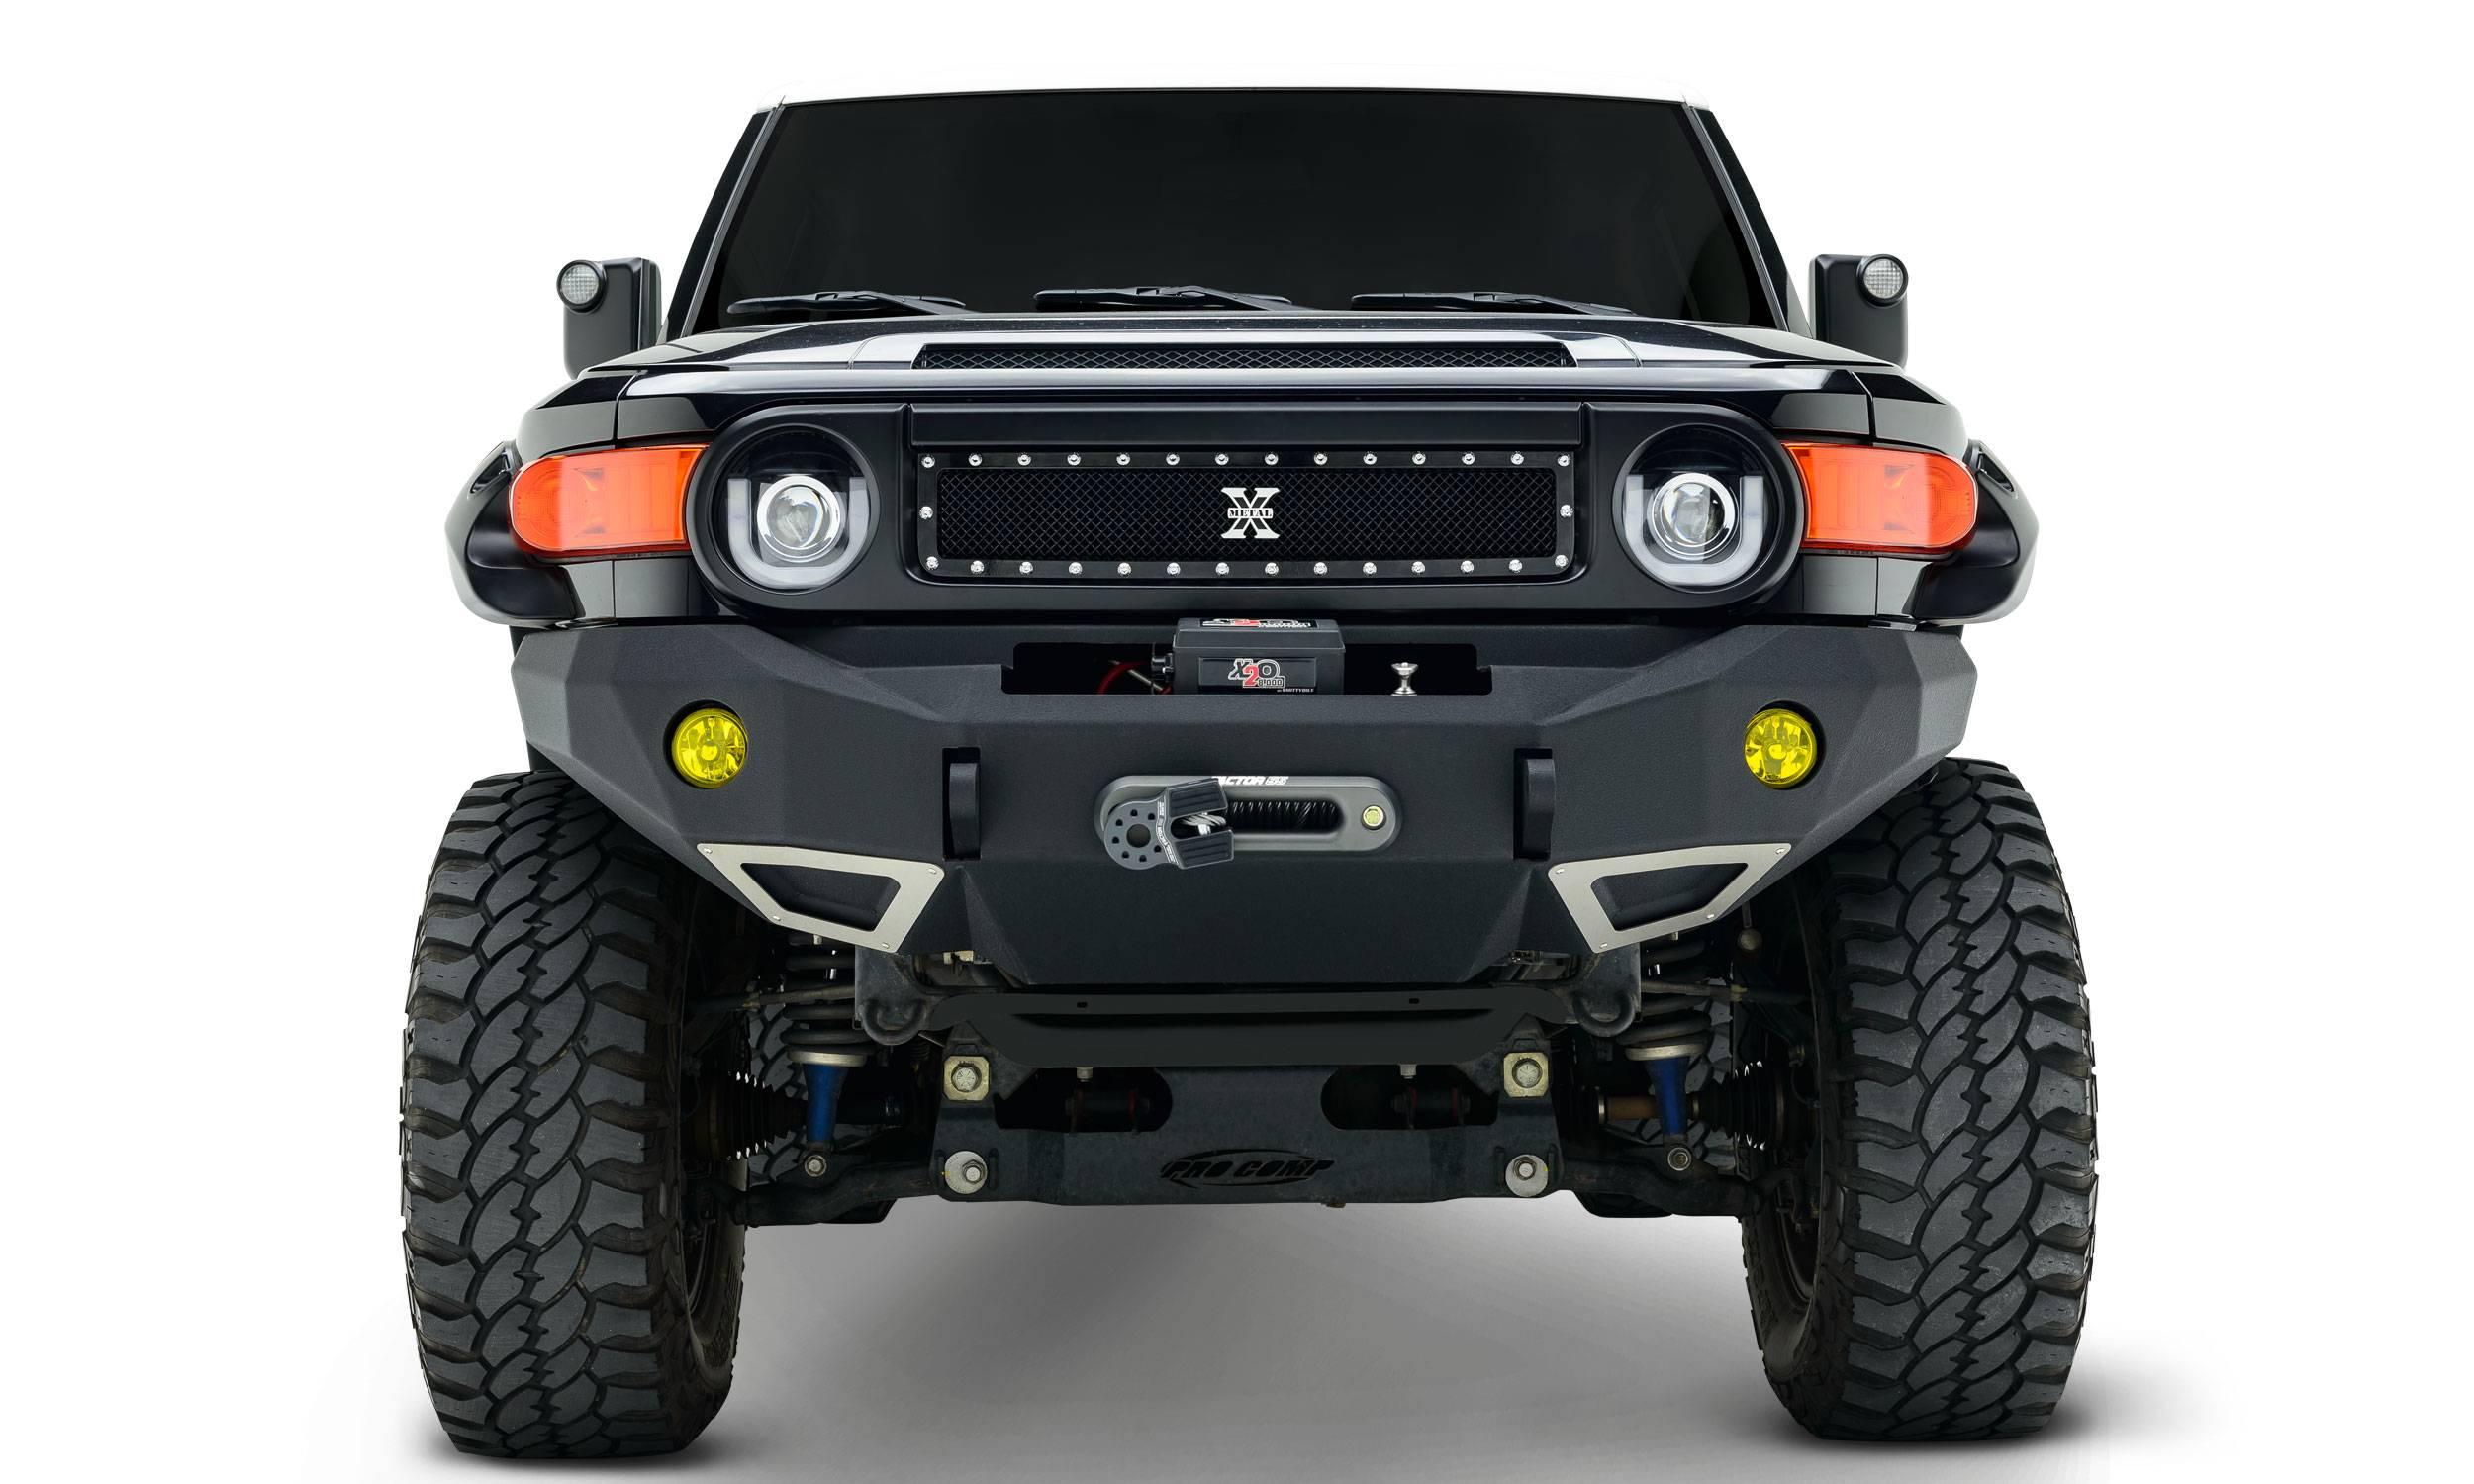 T-REX Grilles - 2007-2014 Toyota FJ Cruiser X-Metal Grille, Black, 1 Pc, Insert, Chrome Studs - PN #6719321